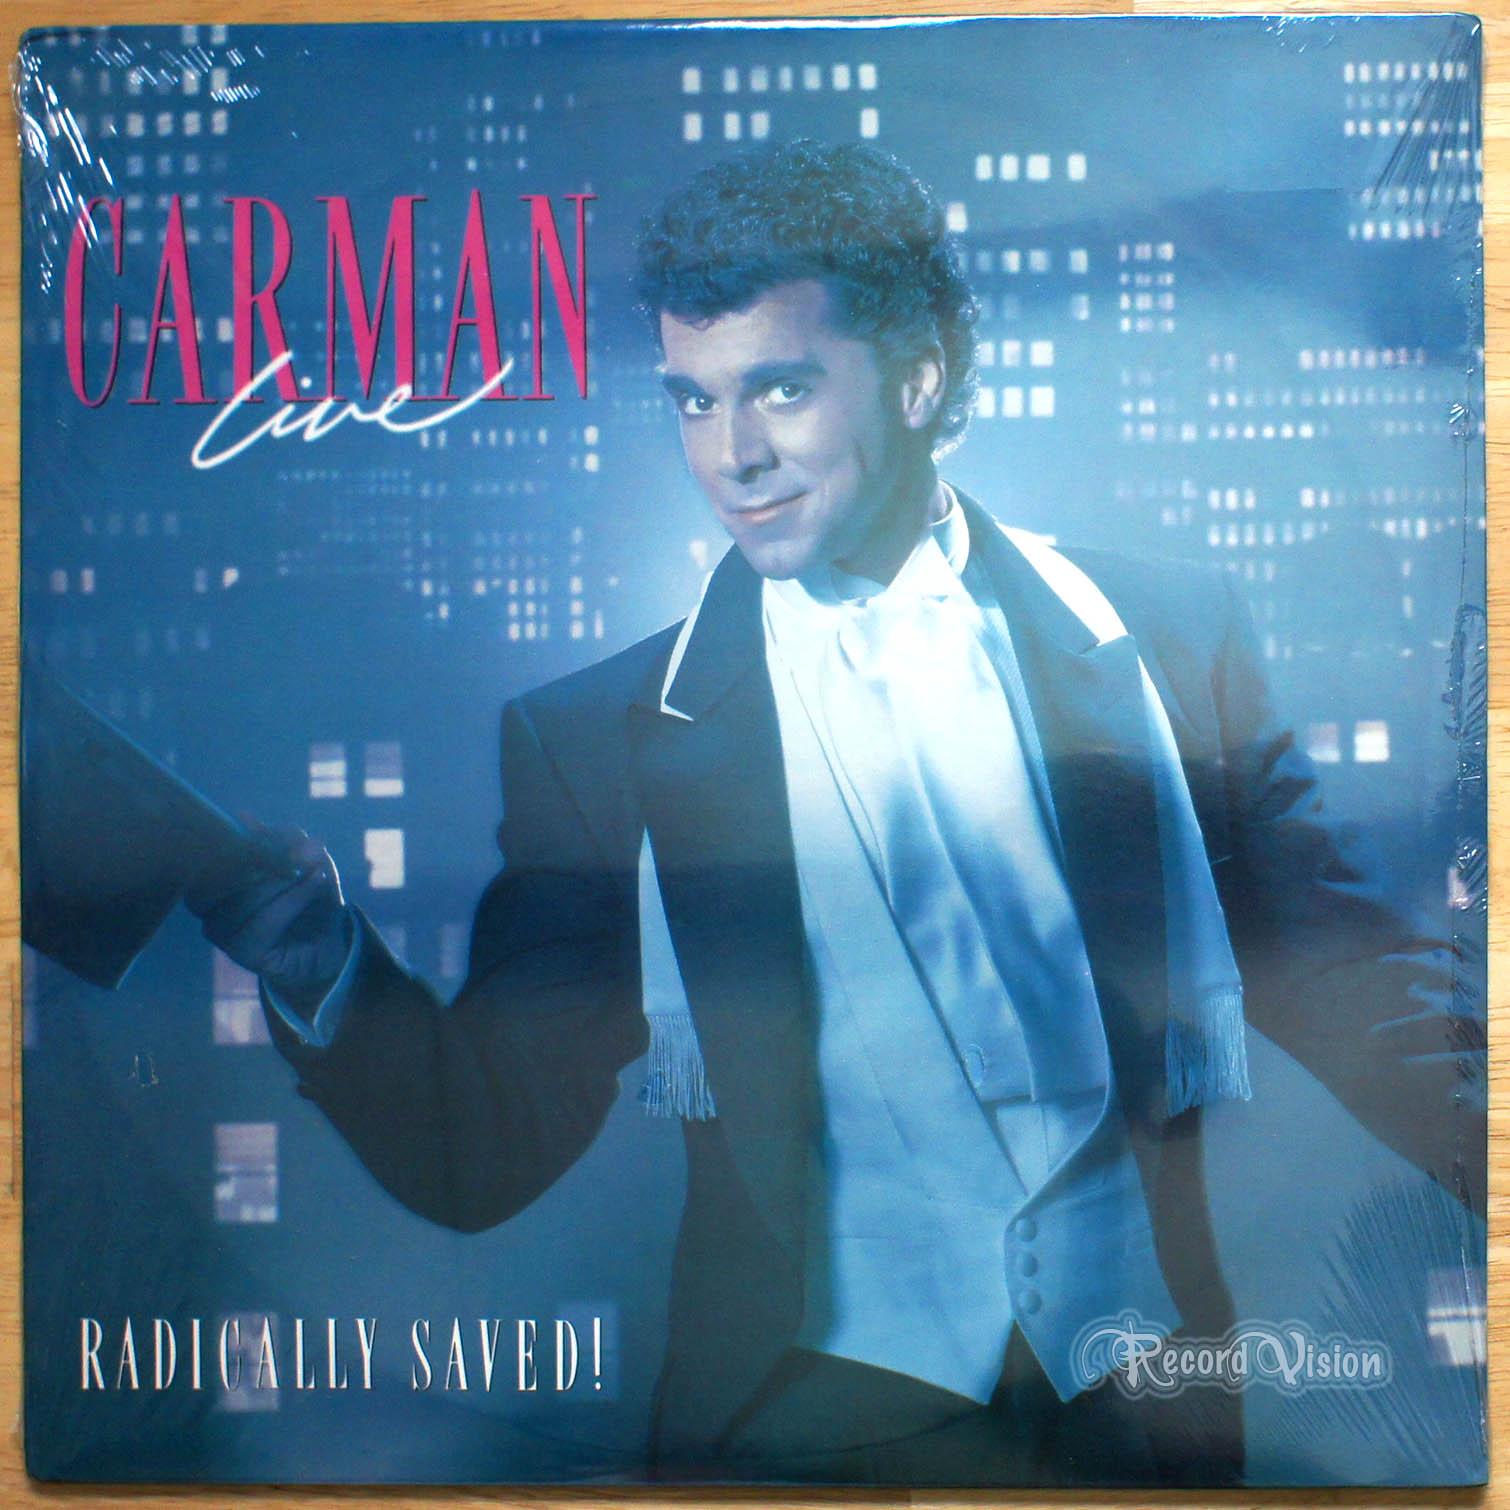 CARMAN - Live: Radically Saved - LP